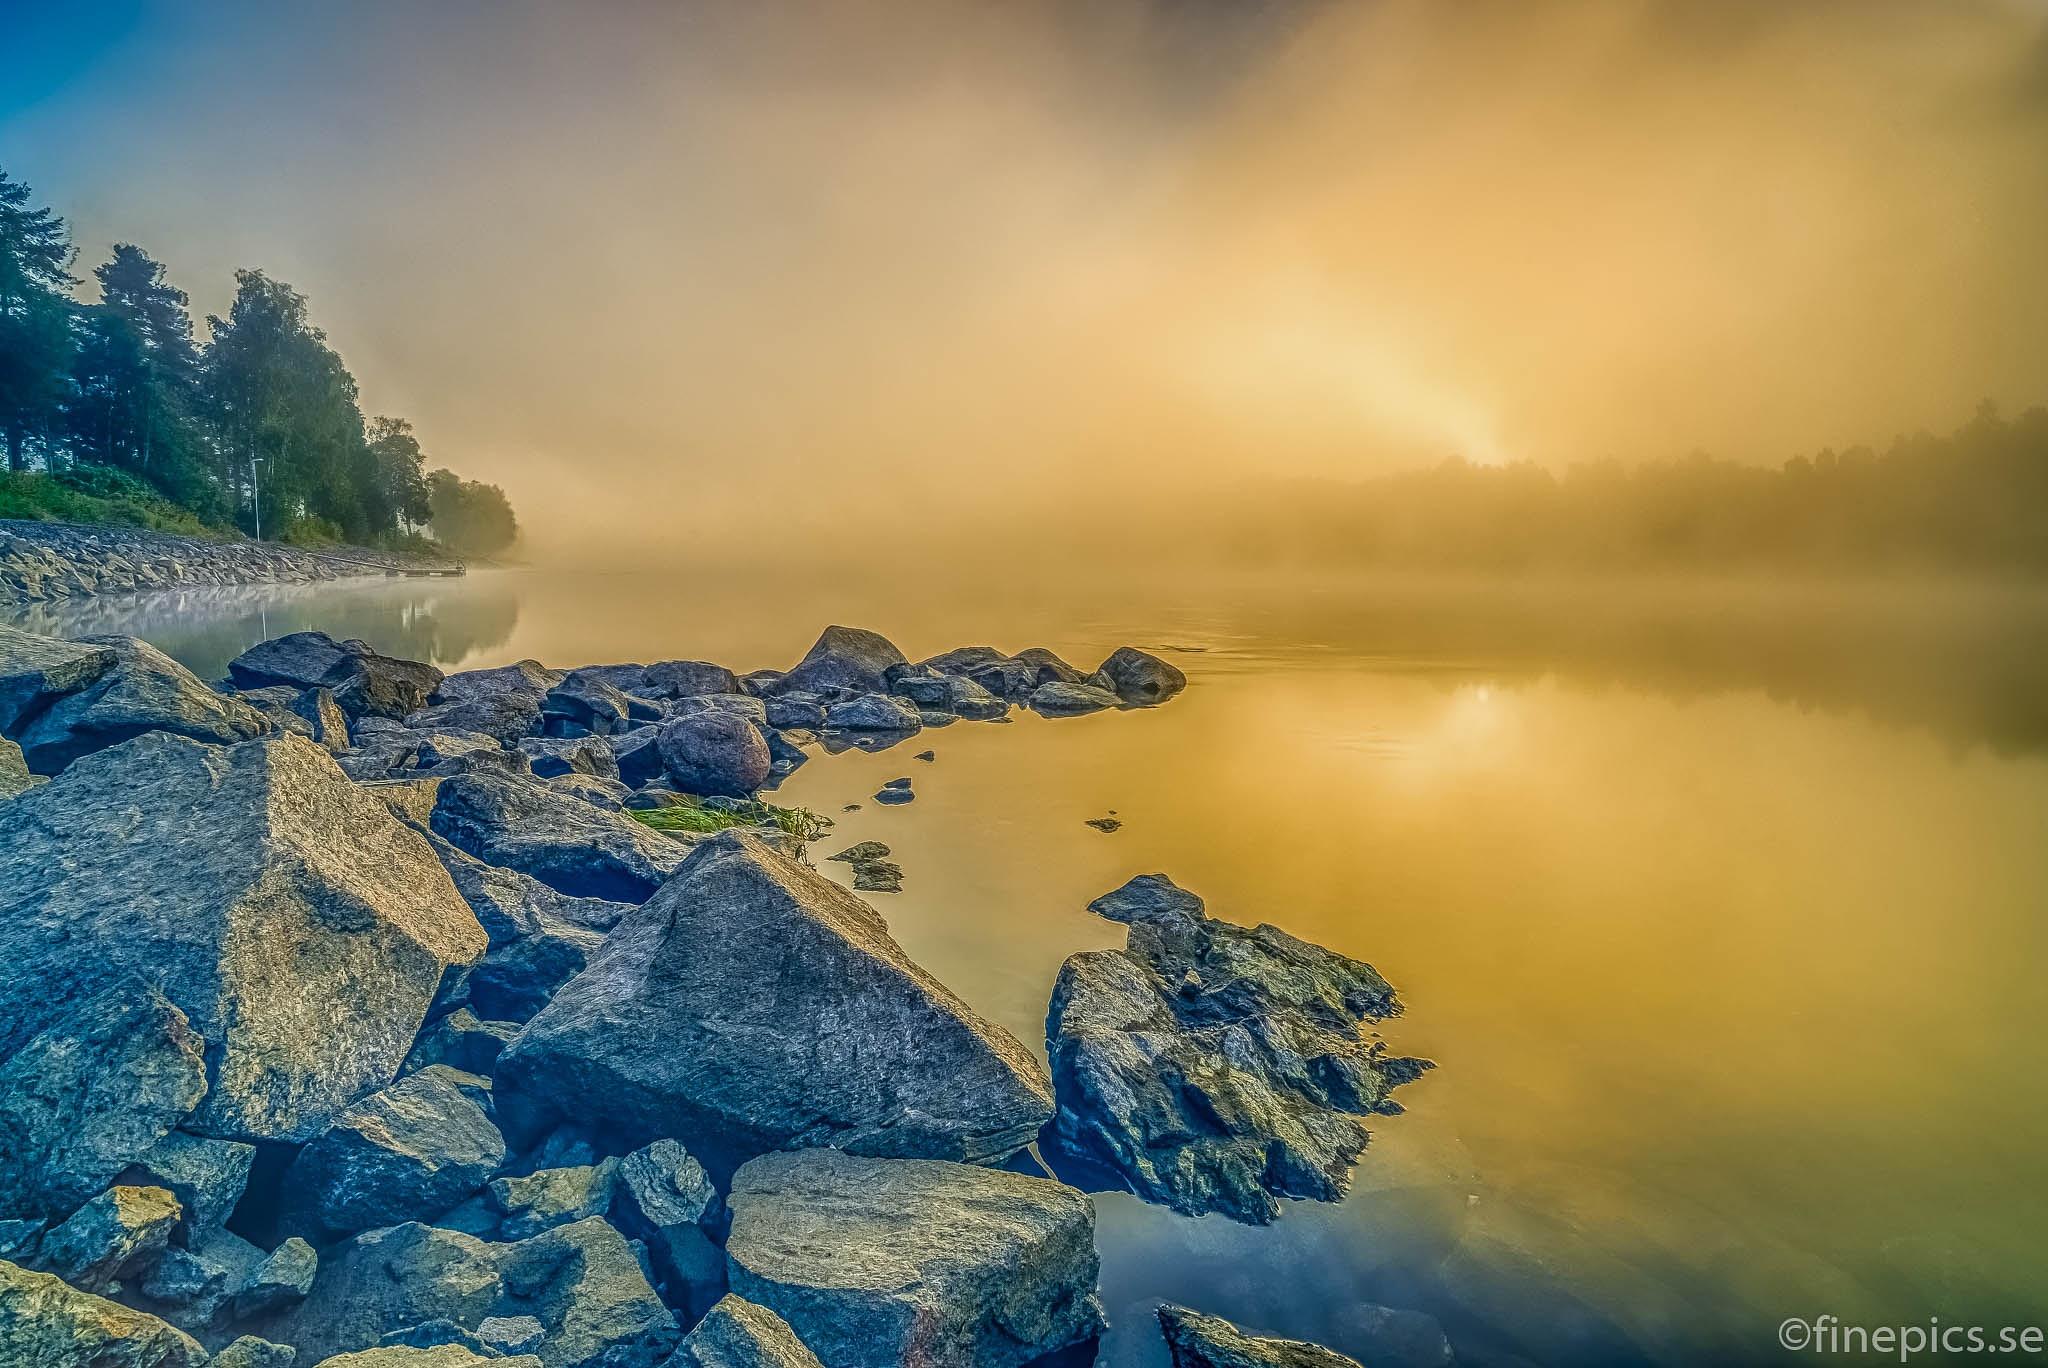 A sunrise in Vännäs, Sweden by Johan Bergenstråhle